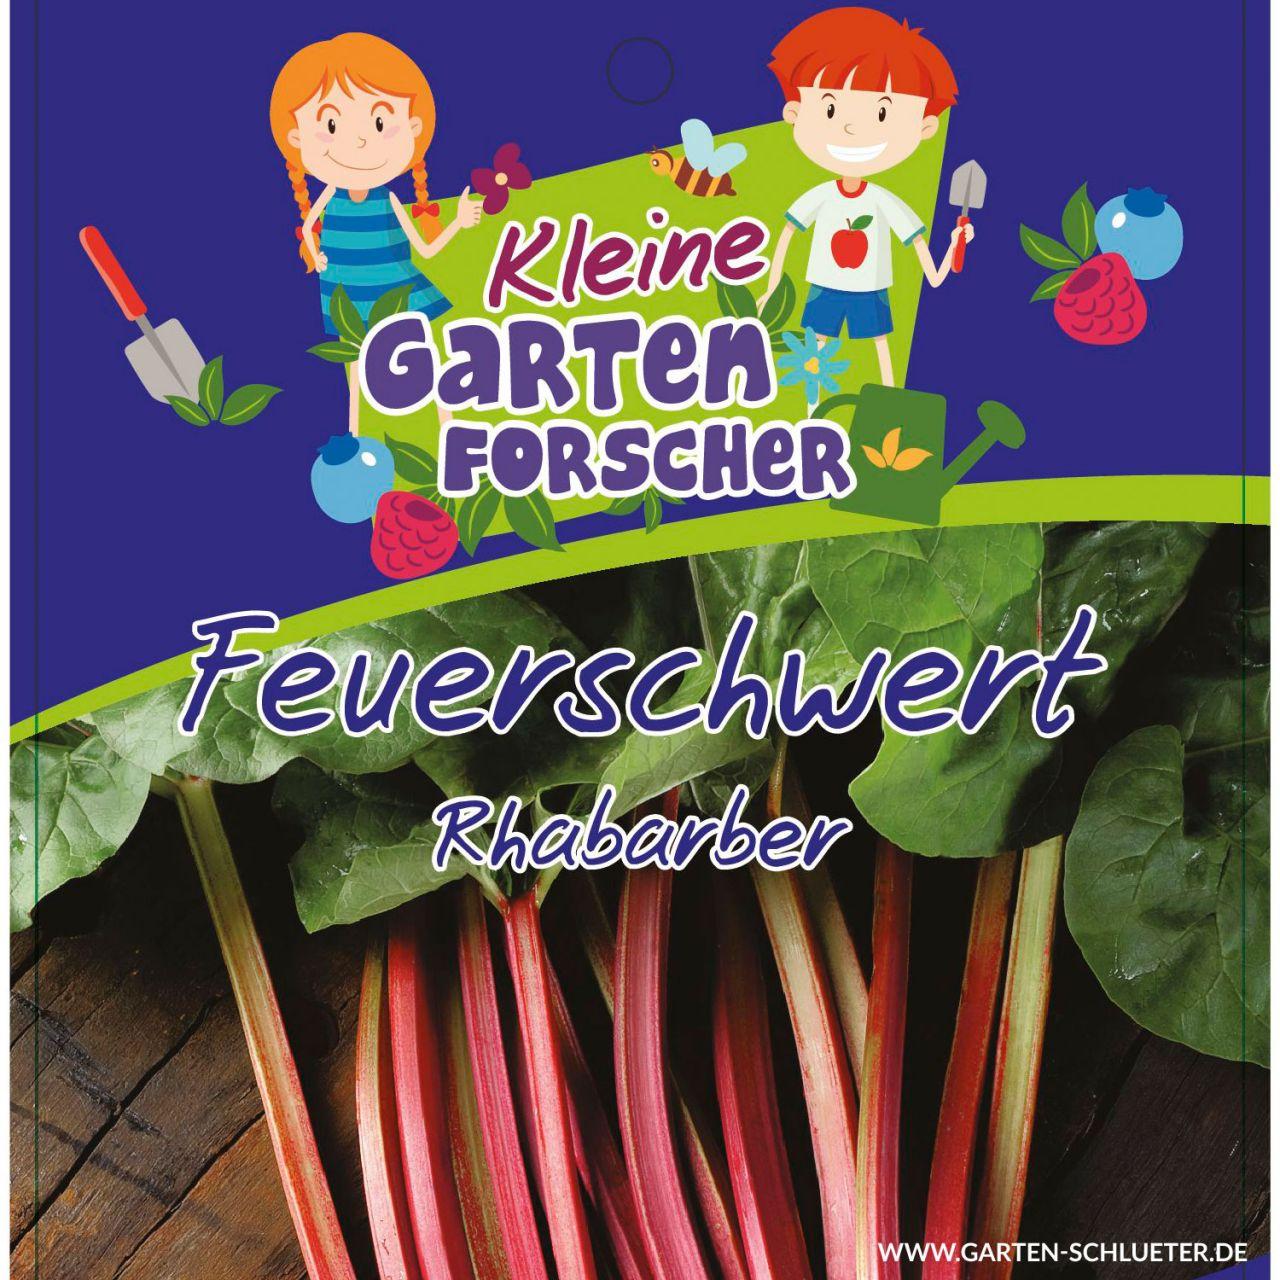 Rhabarber 'Feuerschwert' - Kleine Gartenforscher